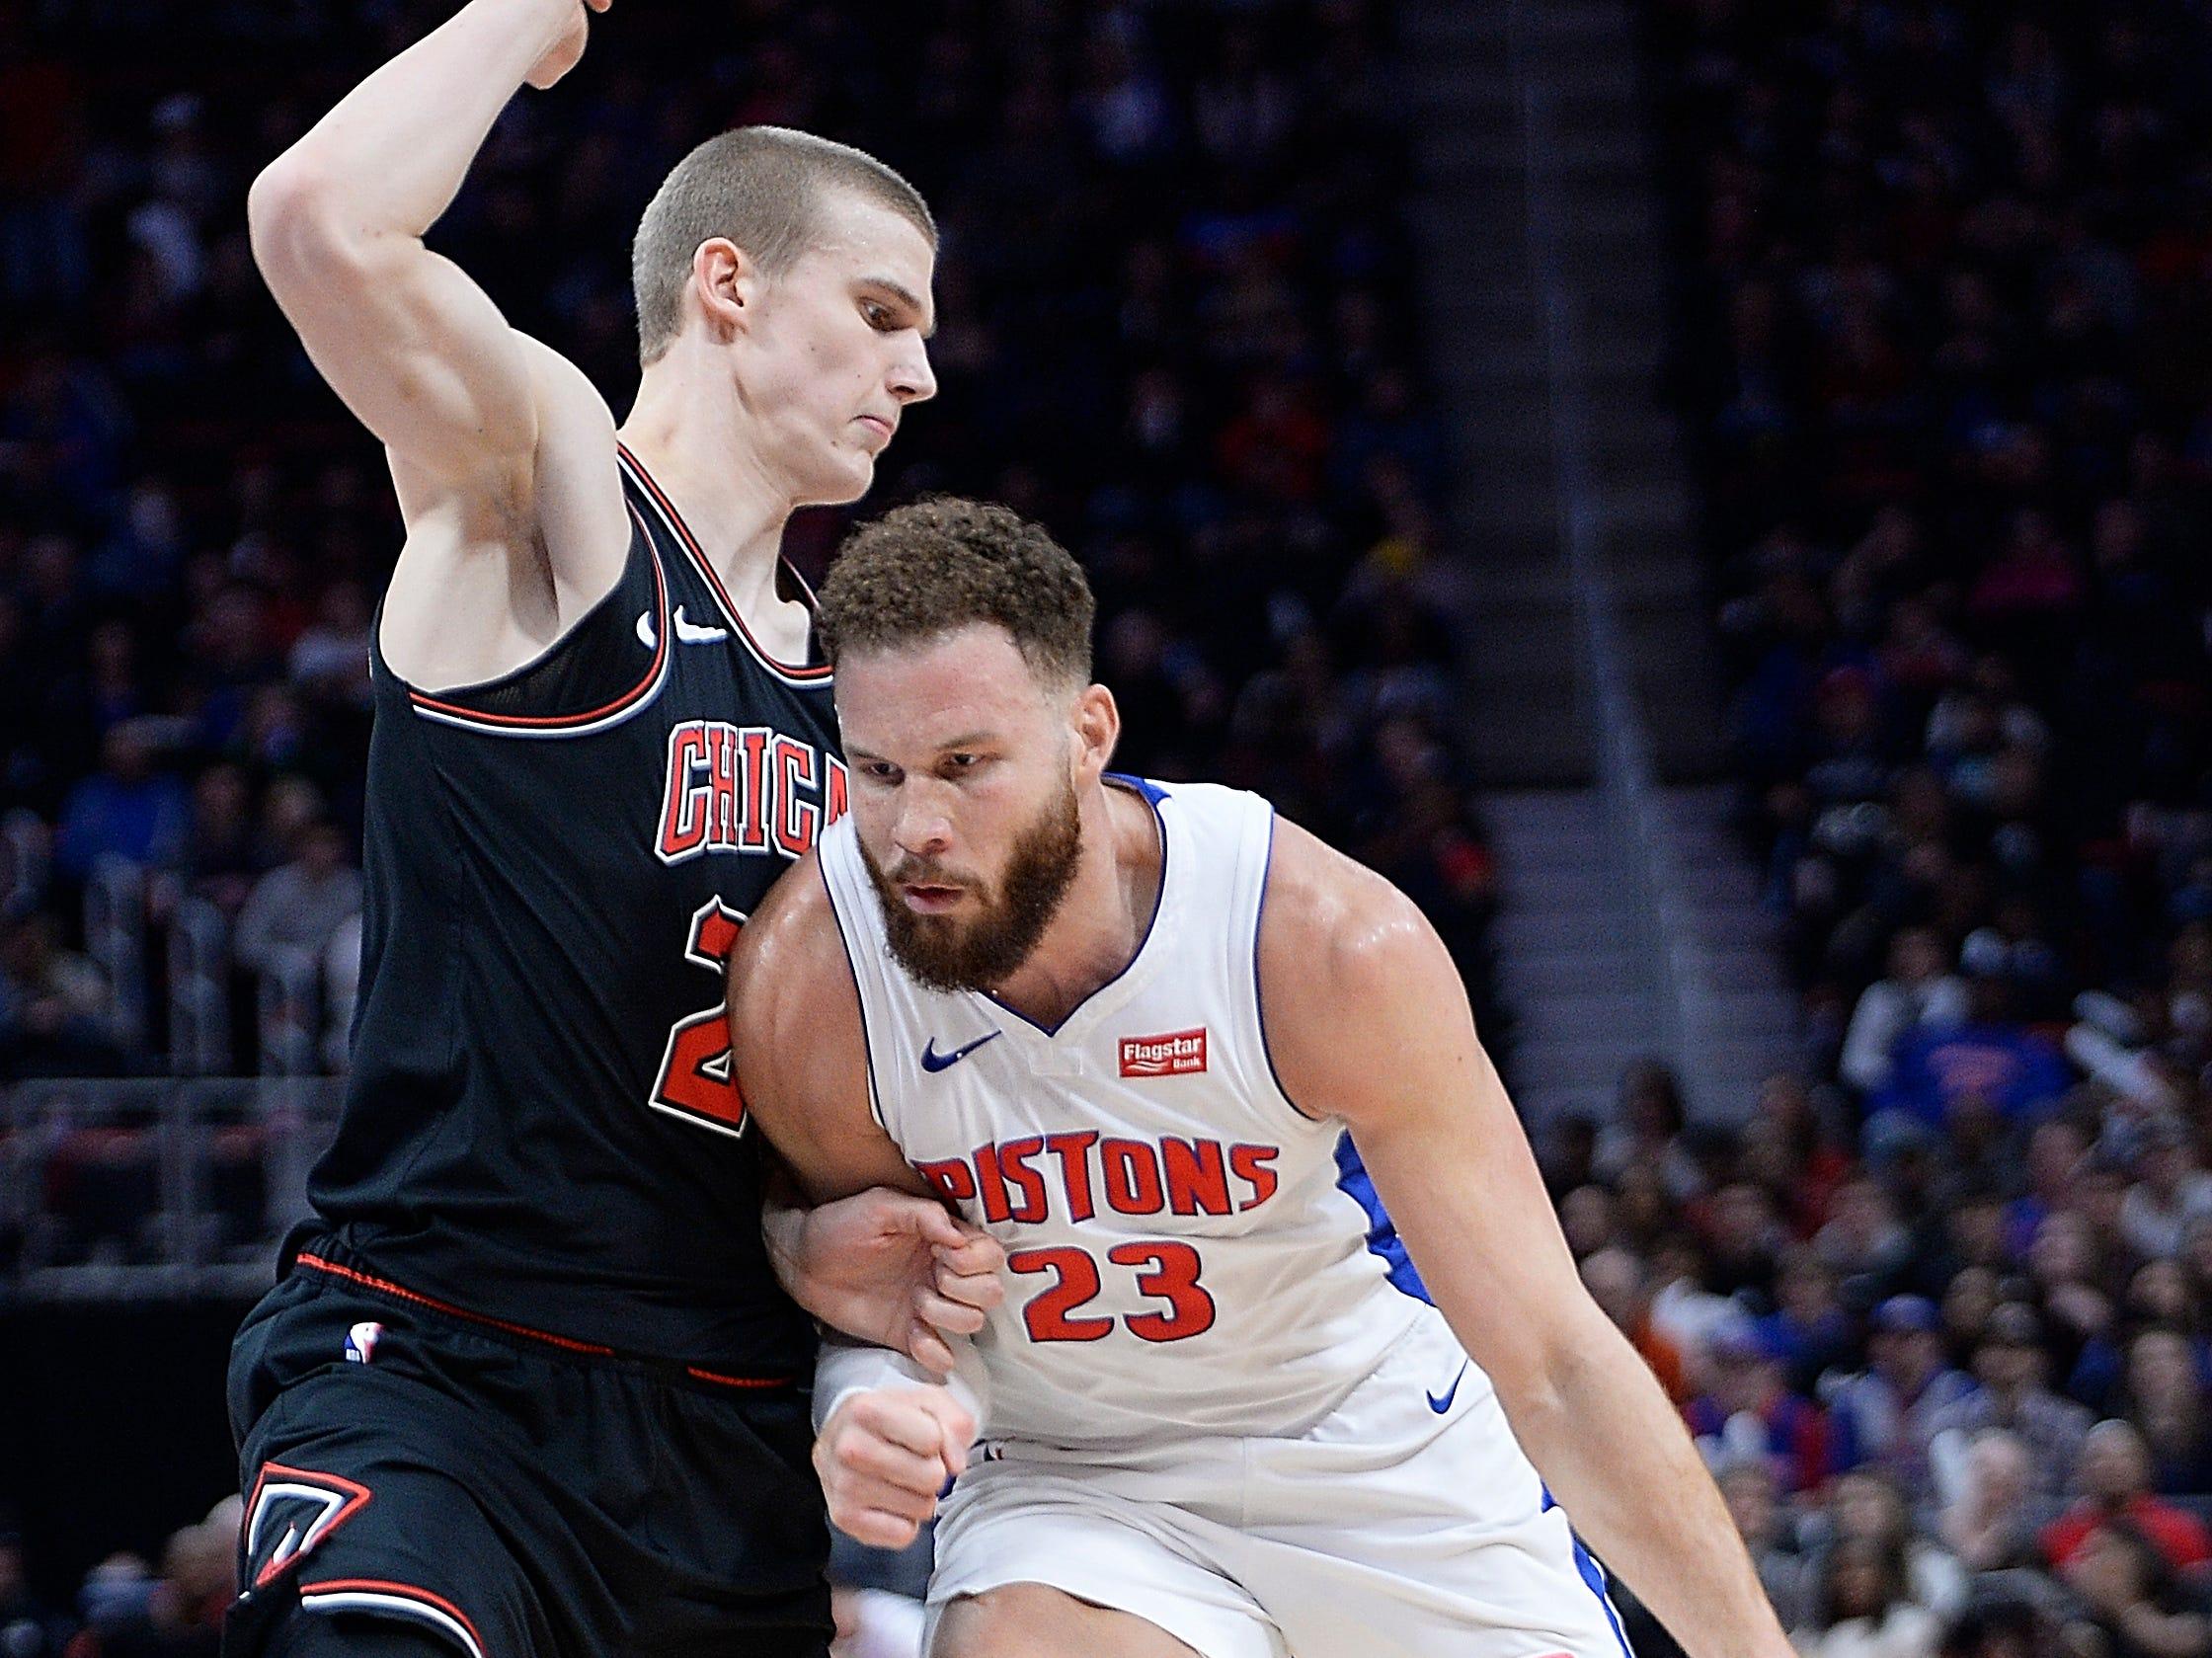 Pistons' Blake Griffin drives around Bulls' Lauri Markkanen in the third quarter.